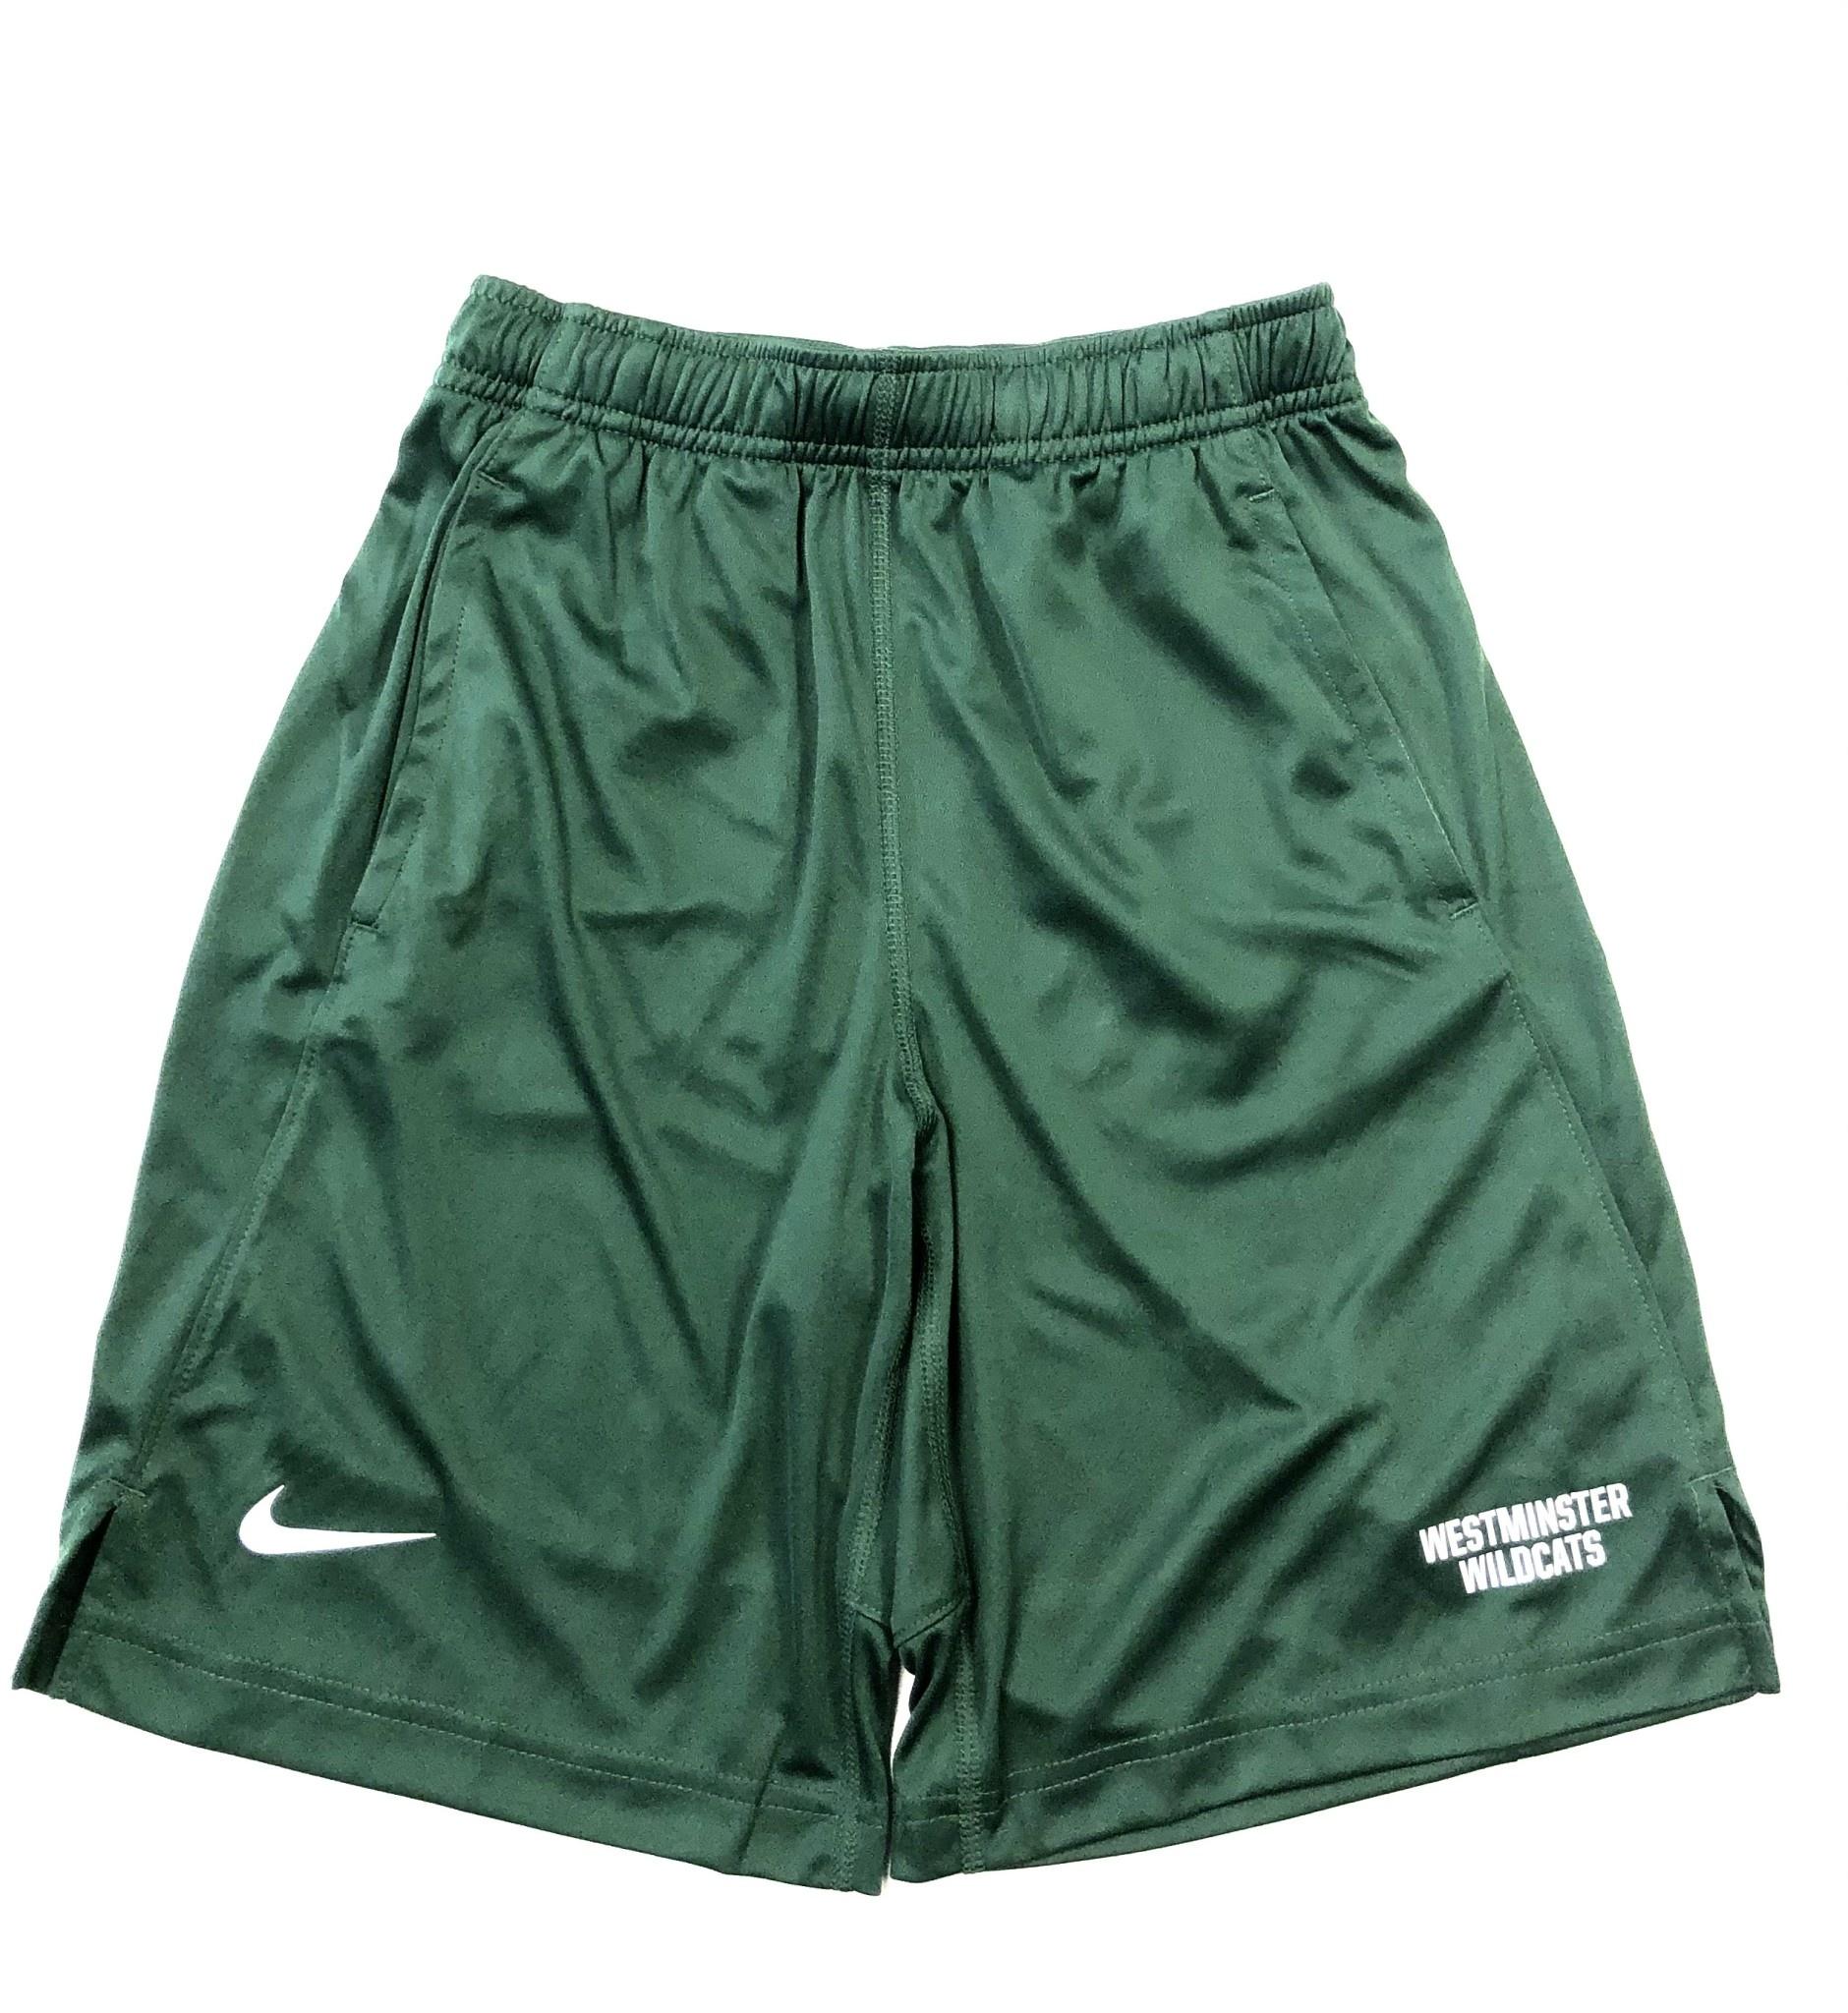 Nike Shorts: Boys Green Fly 2.0 WM Wildcats